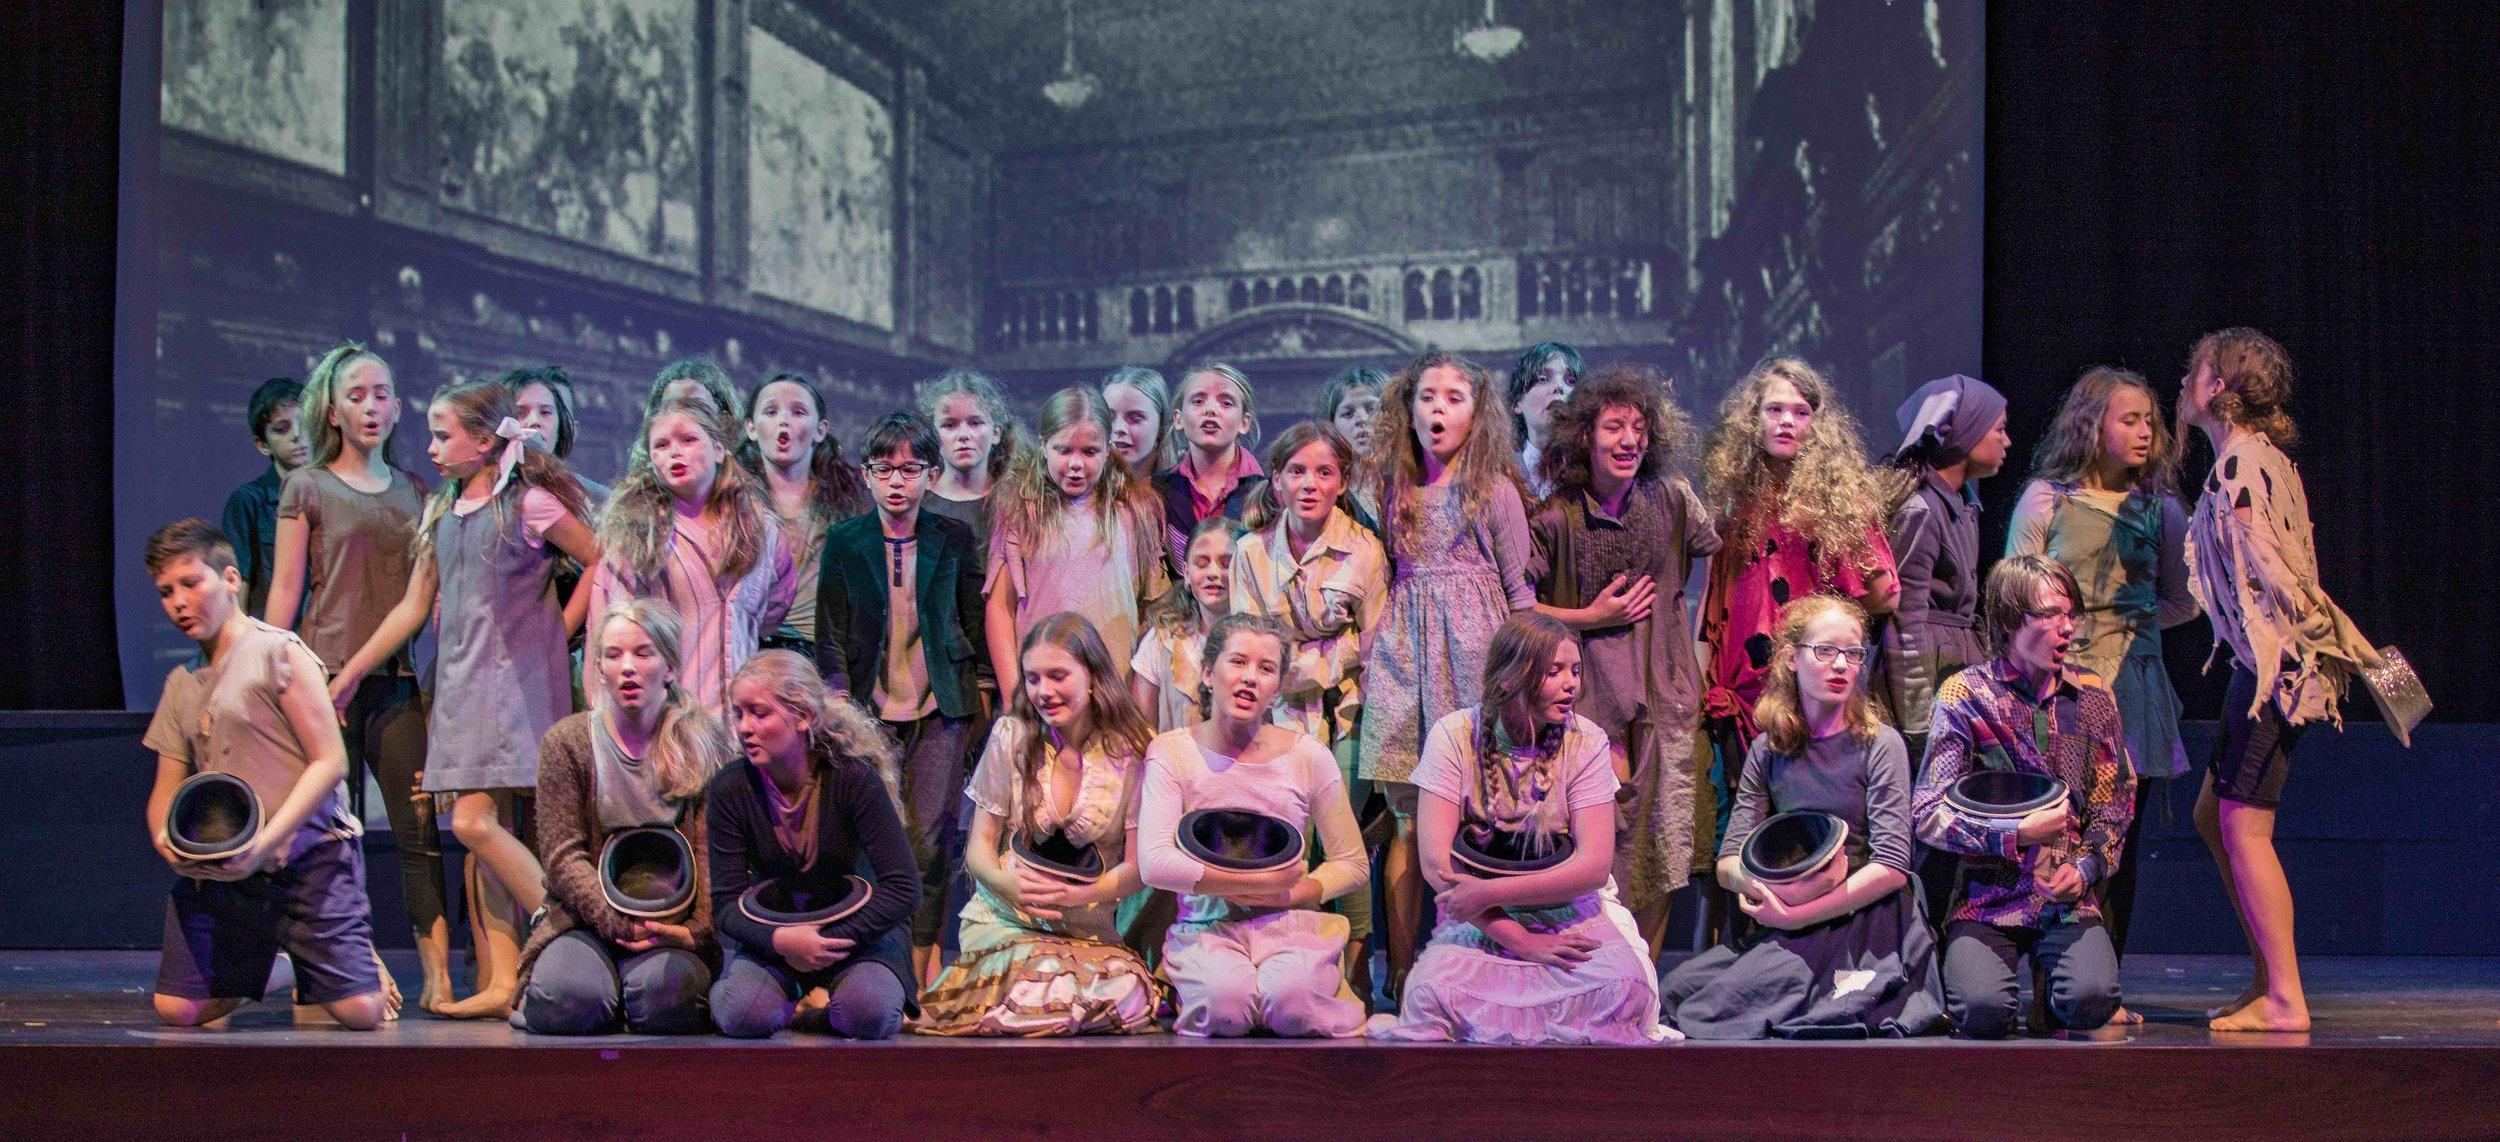 Perth Youth Theatre